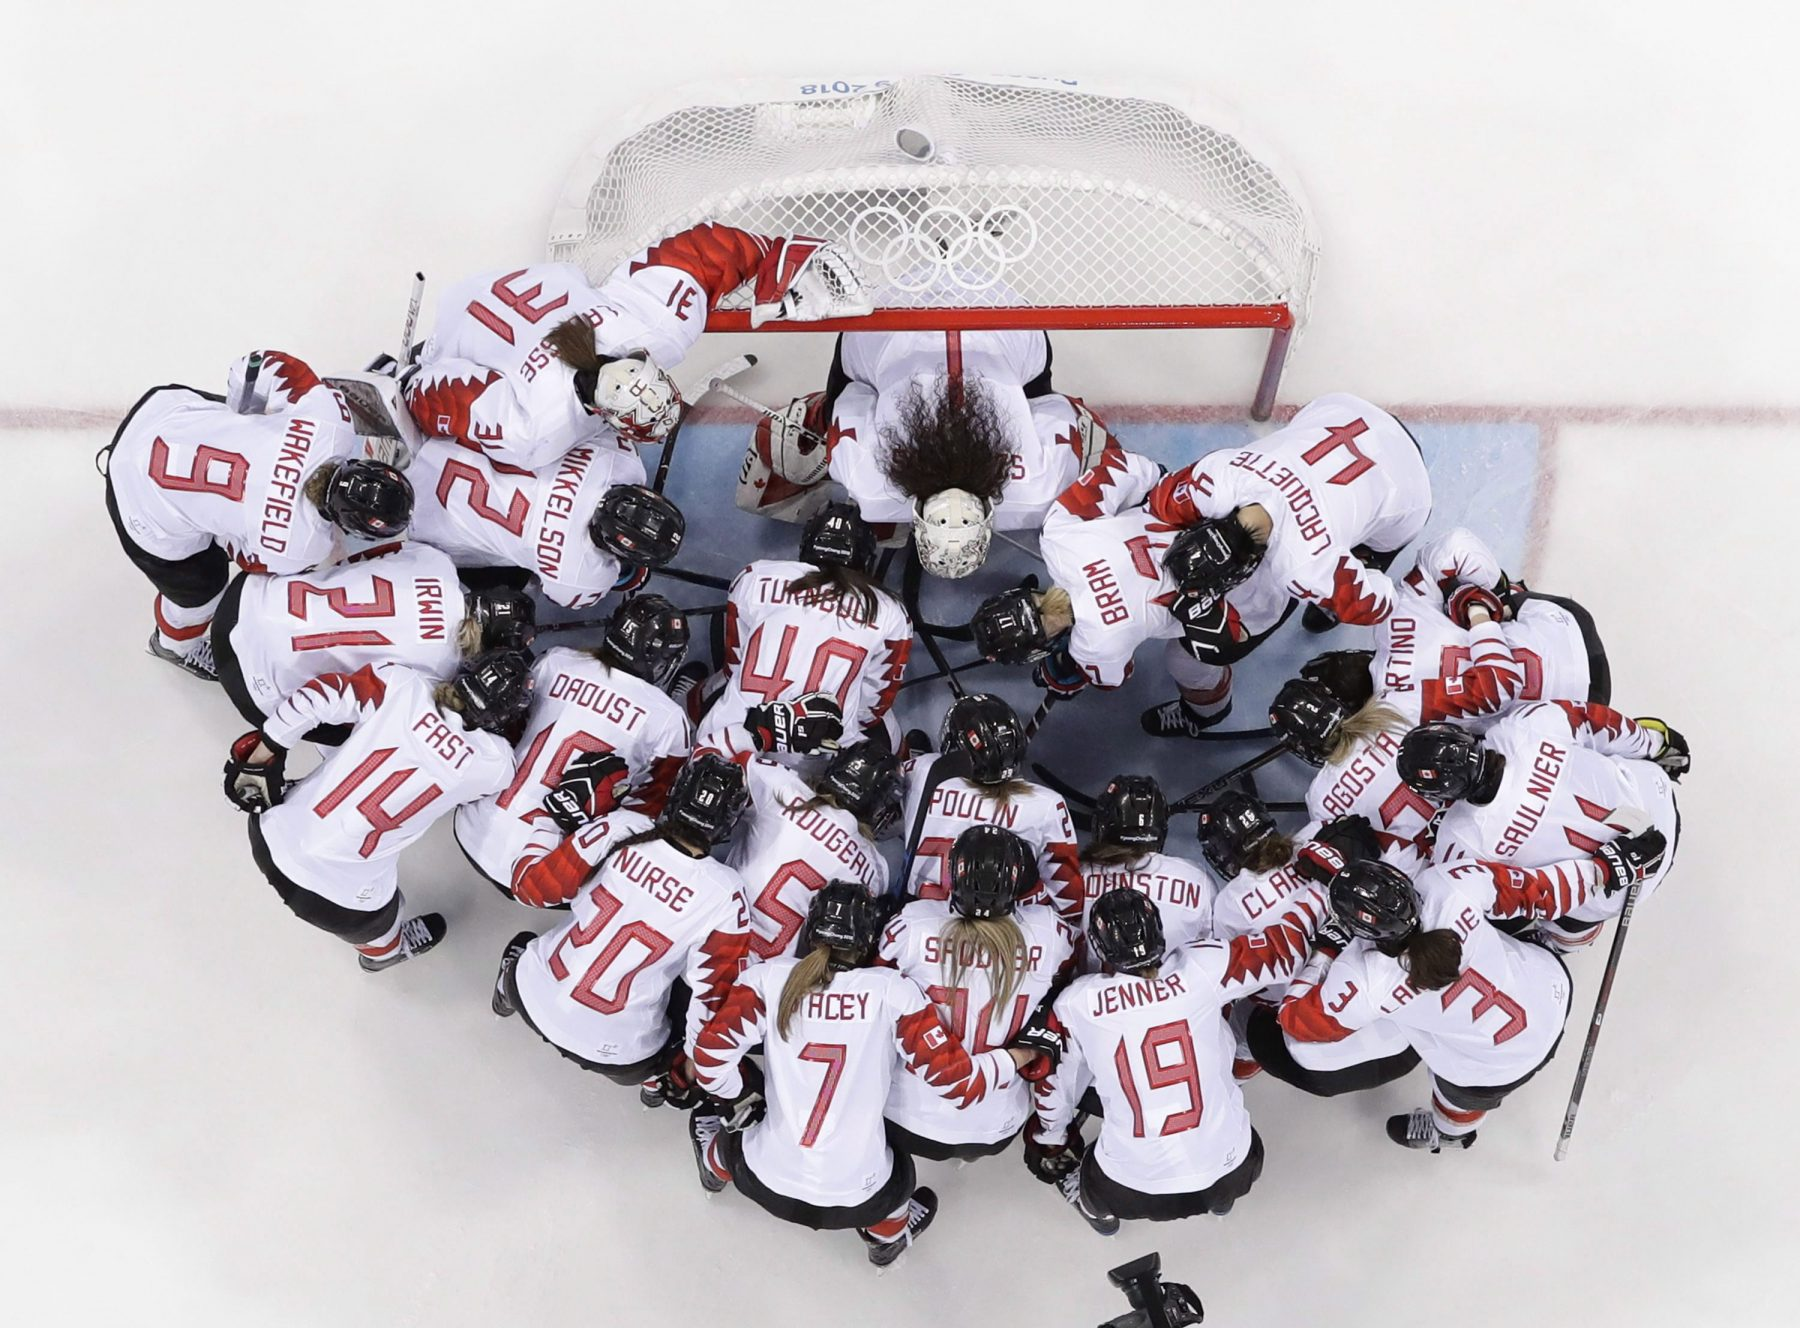 Overhead shot of Team Canada women's hockey players around the net